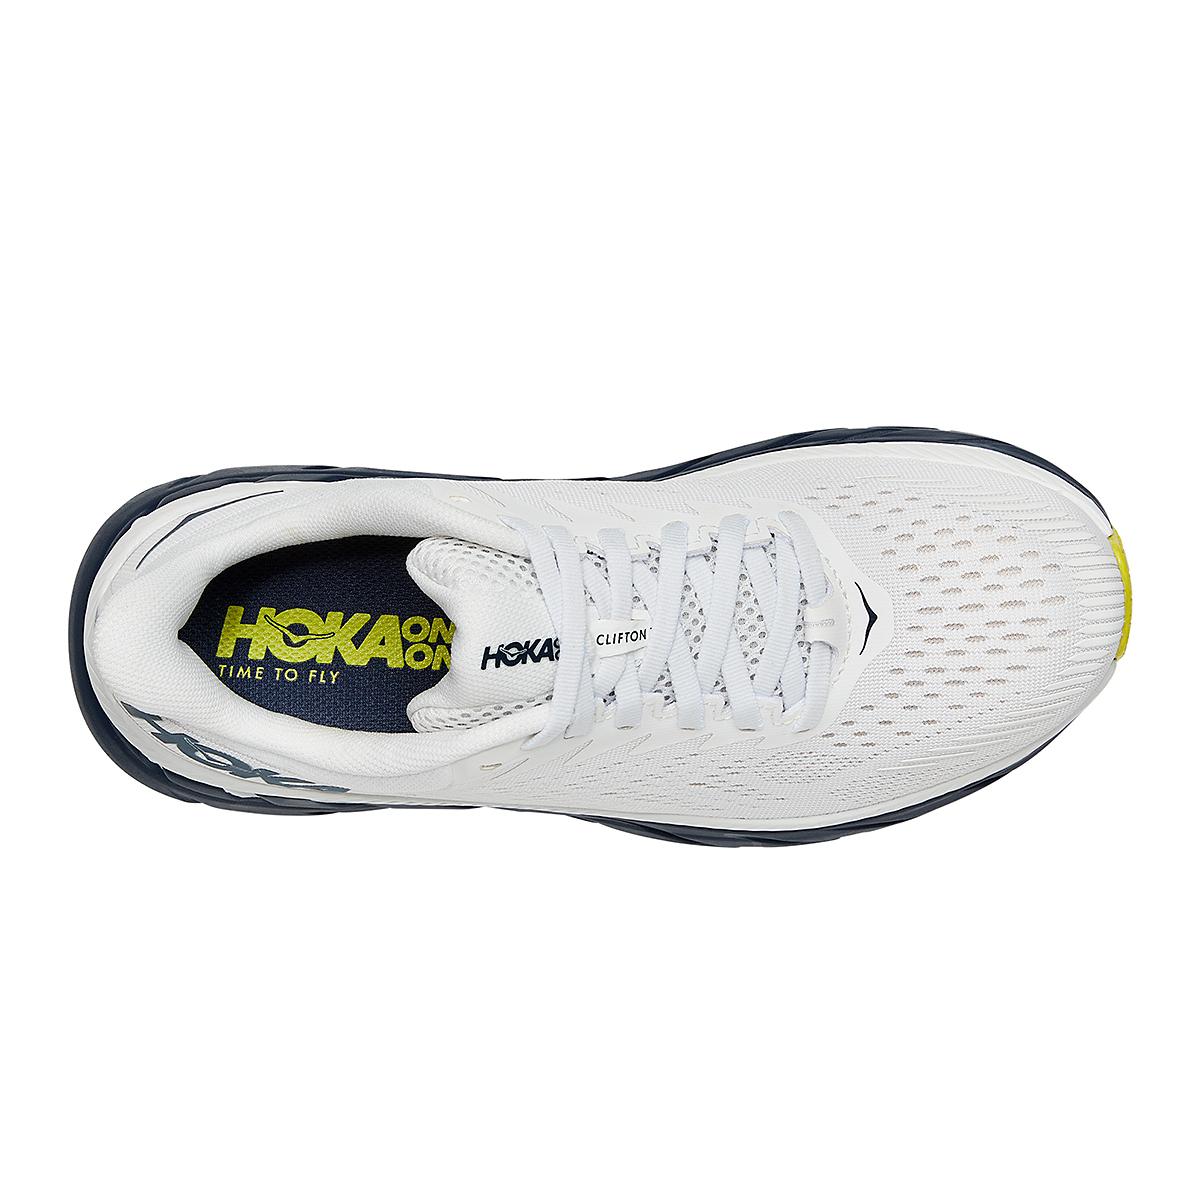 Women's Hoka One One Clifton 7 Running Shoe - Color: Blanc De Blanc - Size: 5 - Width: Regular, Blanc De Blanc, large, image 3